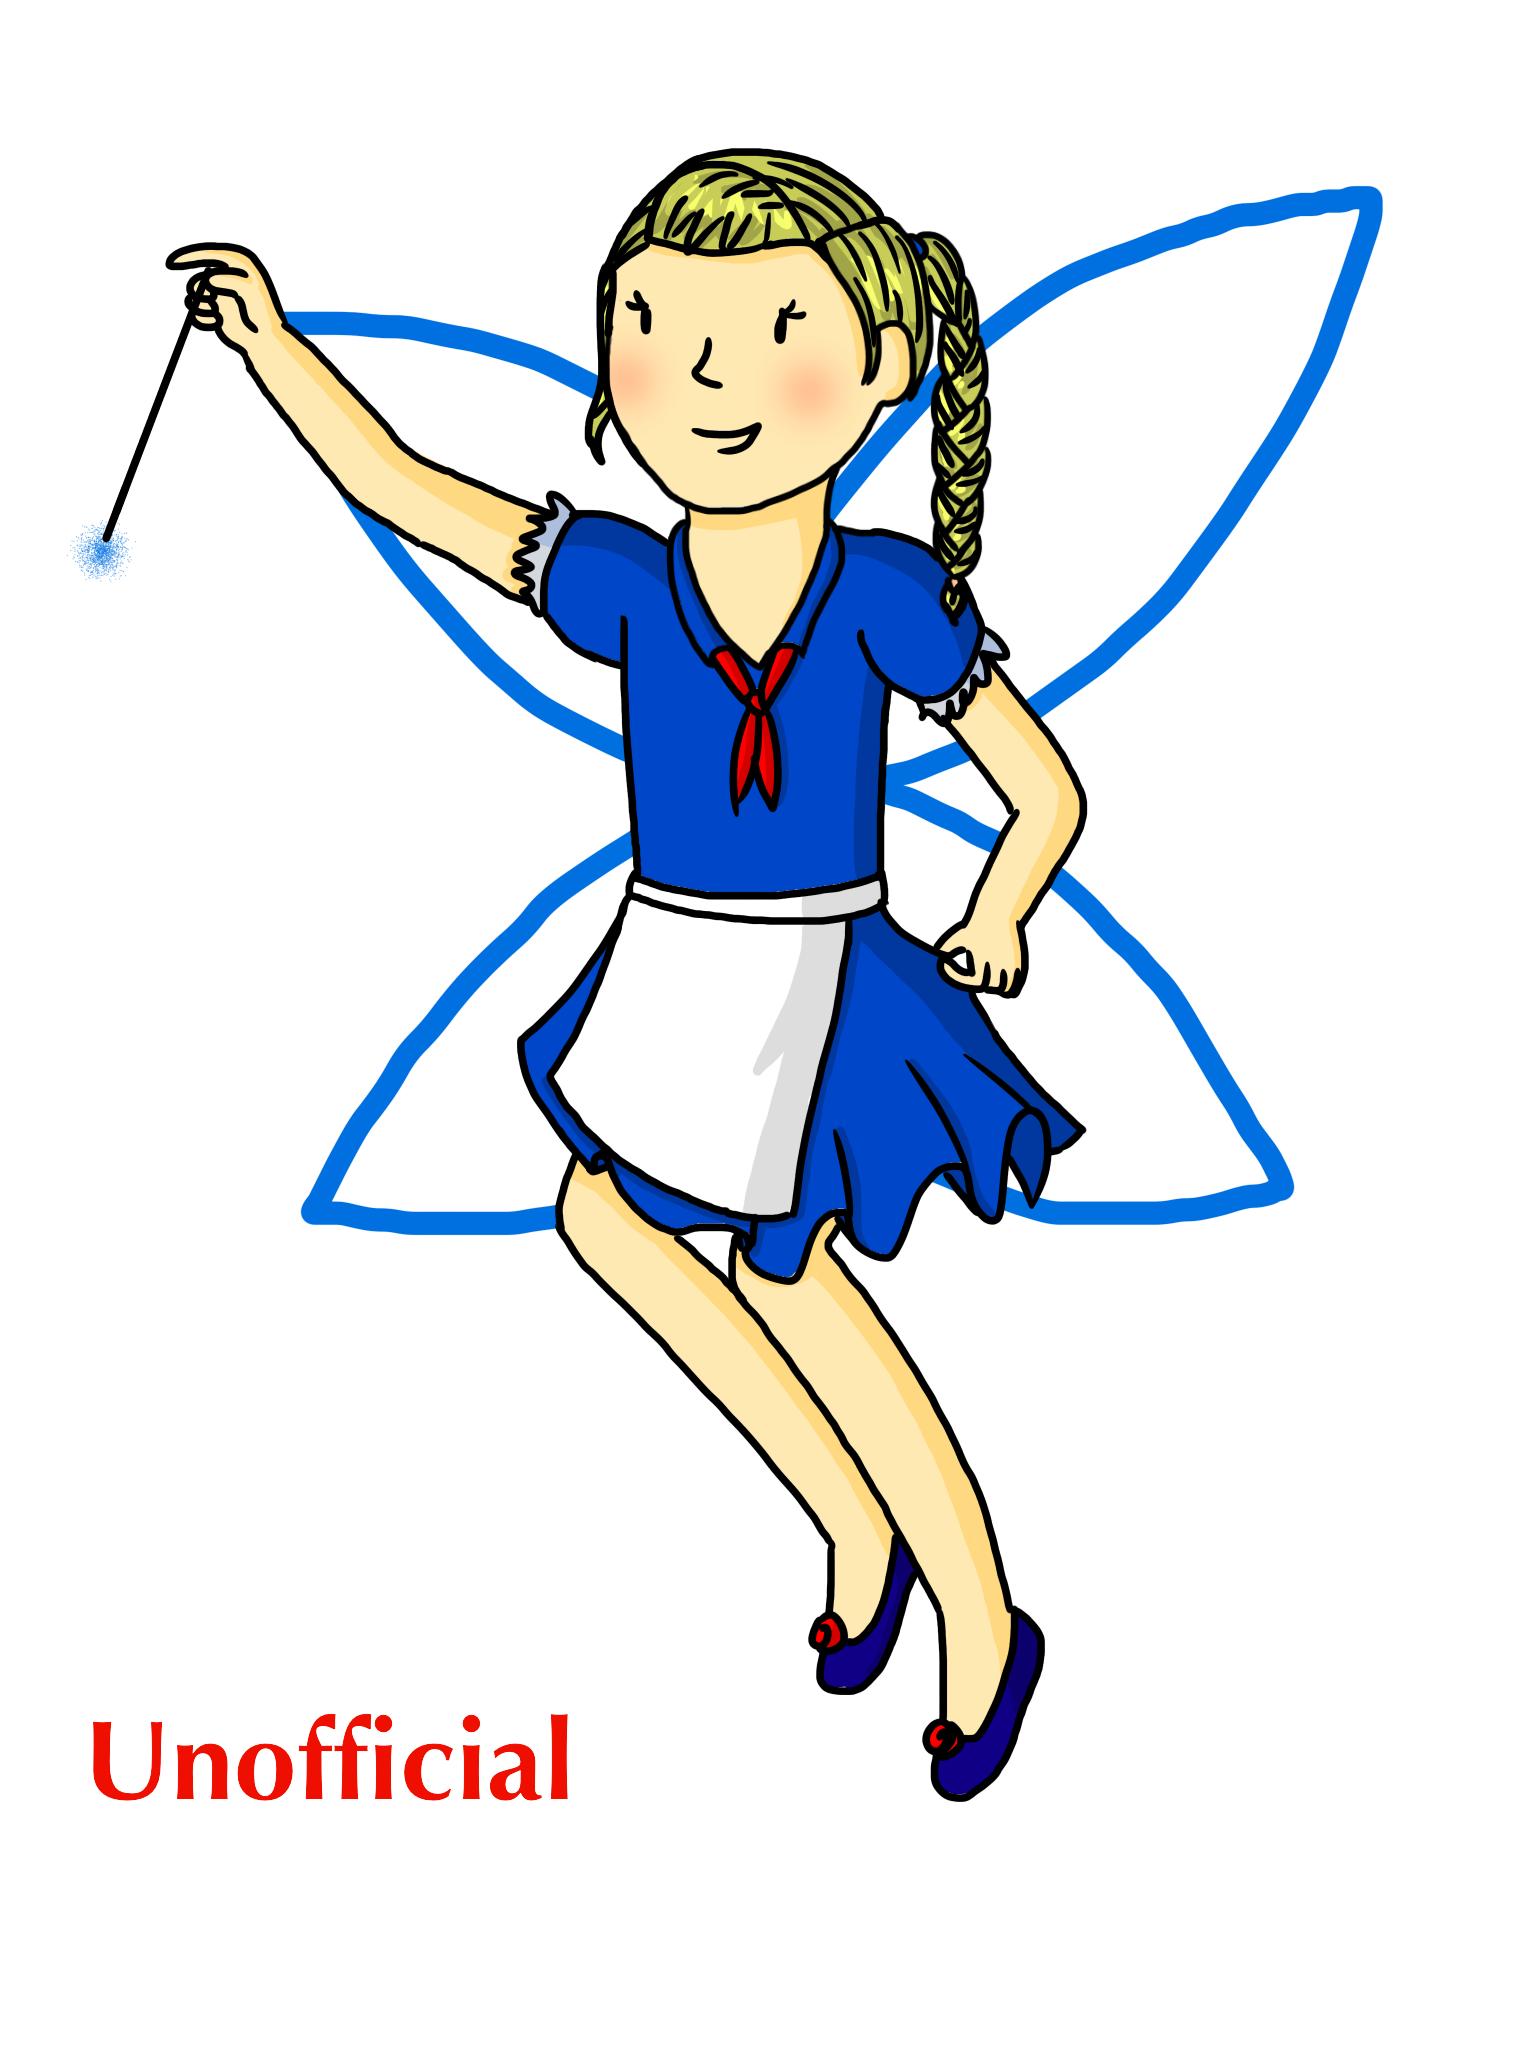 Blue apron wiki - 2nd Prom